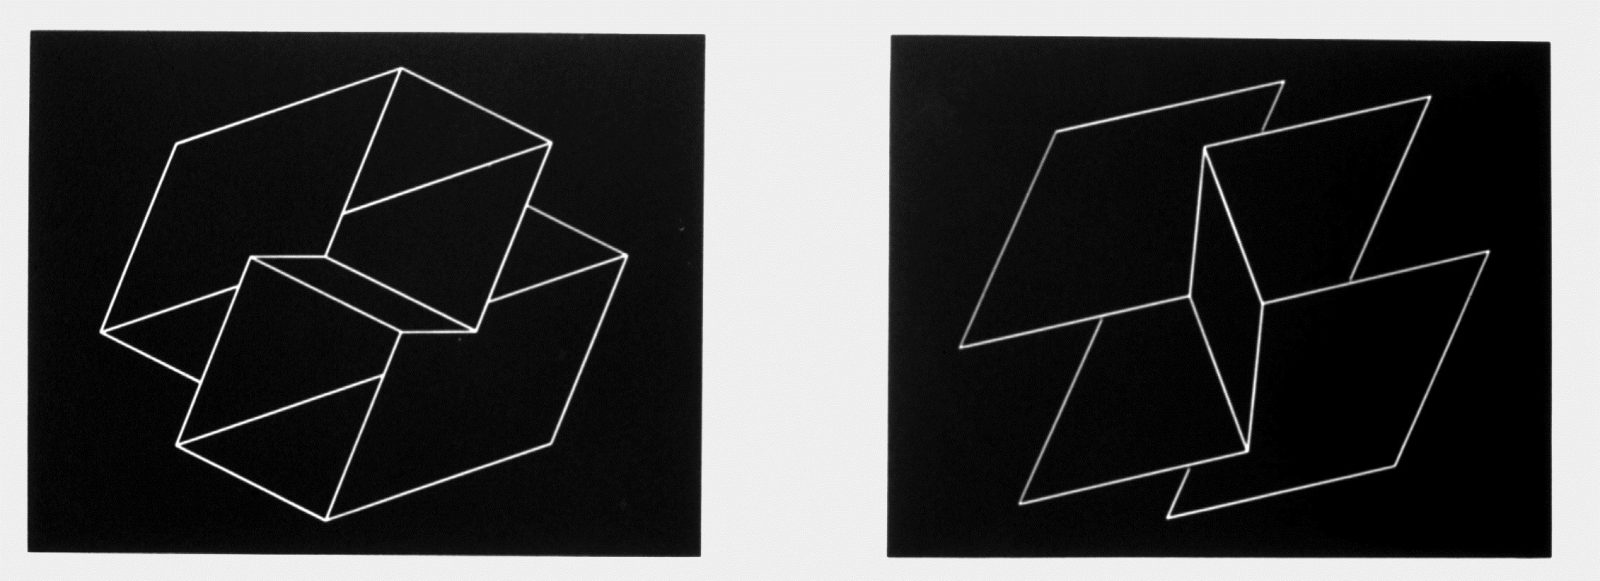 Josef Albers, Formulation : Articulation, Folio II, Folder 10